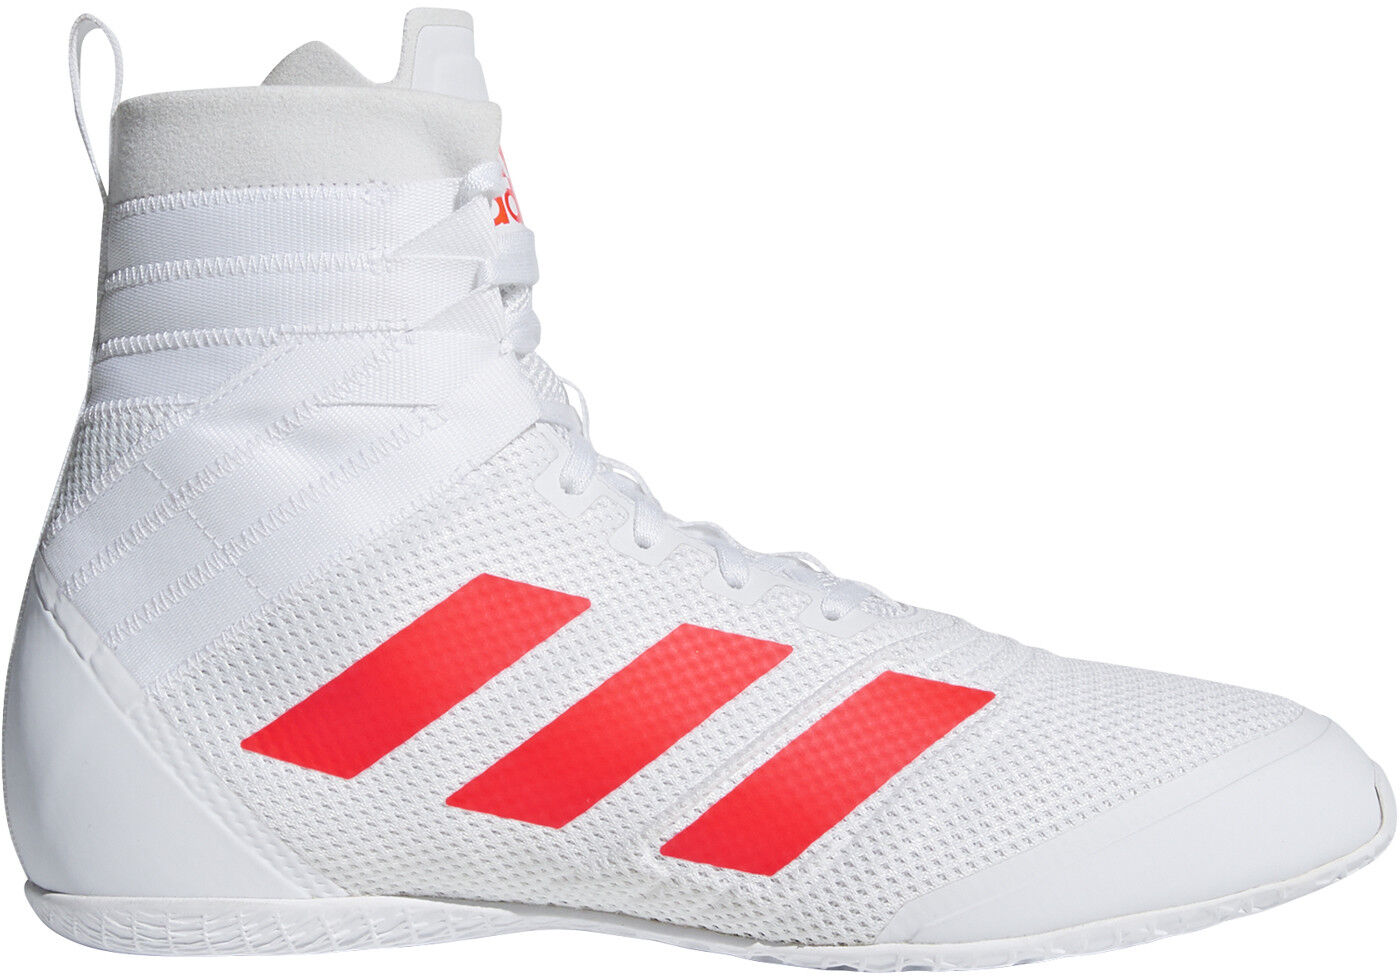 Adidas Speedex 18 Boxing shoes - White